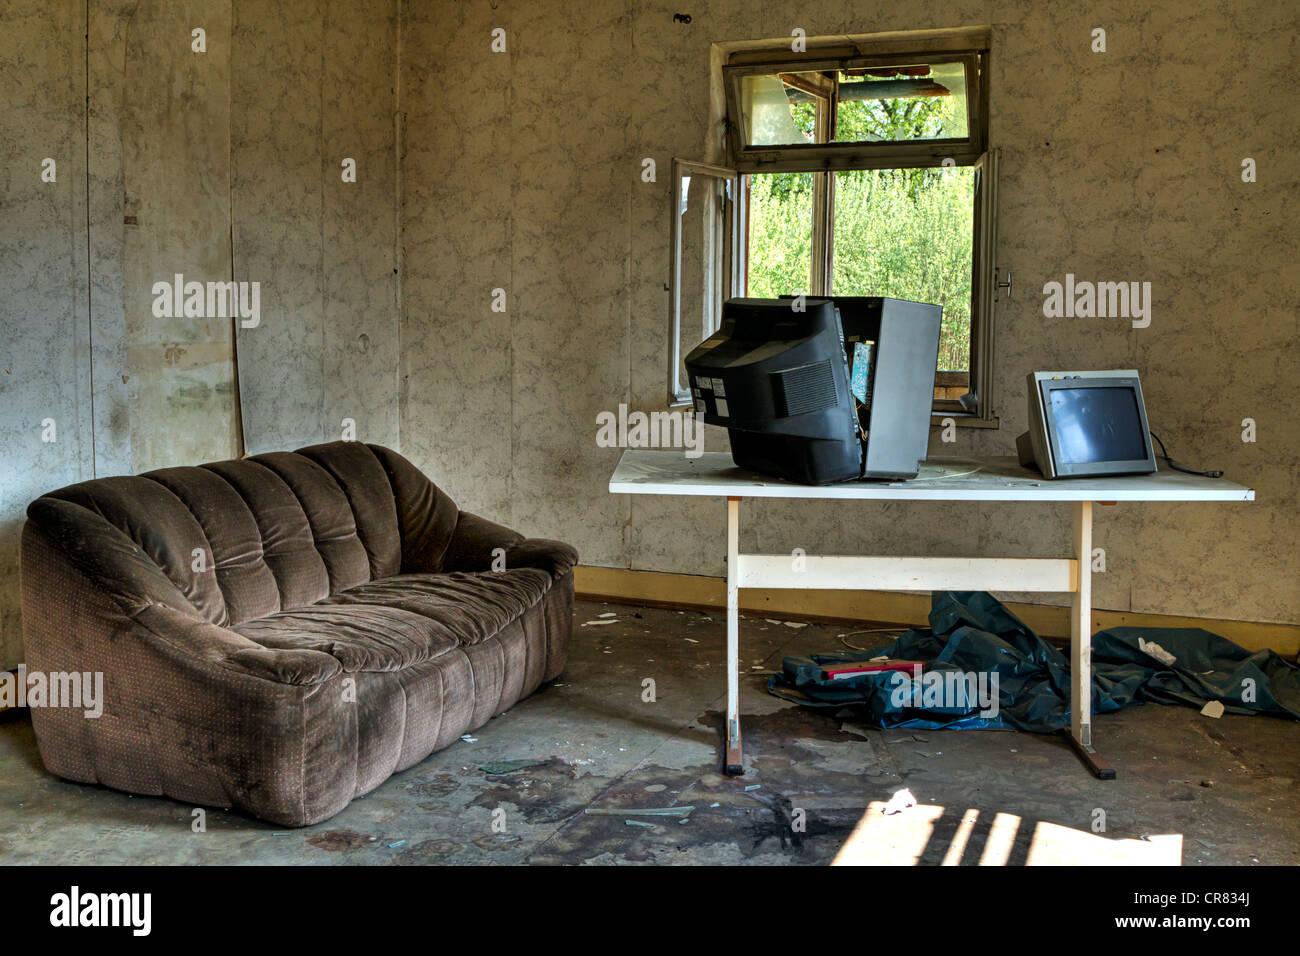 Wohnzimmer Sofa Tv Ruinosen Altbau Stockfoto Bild 48735922 Alamy